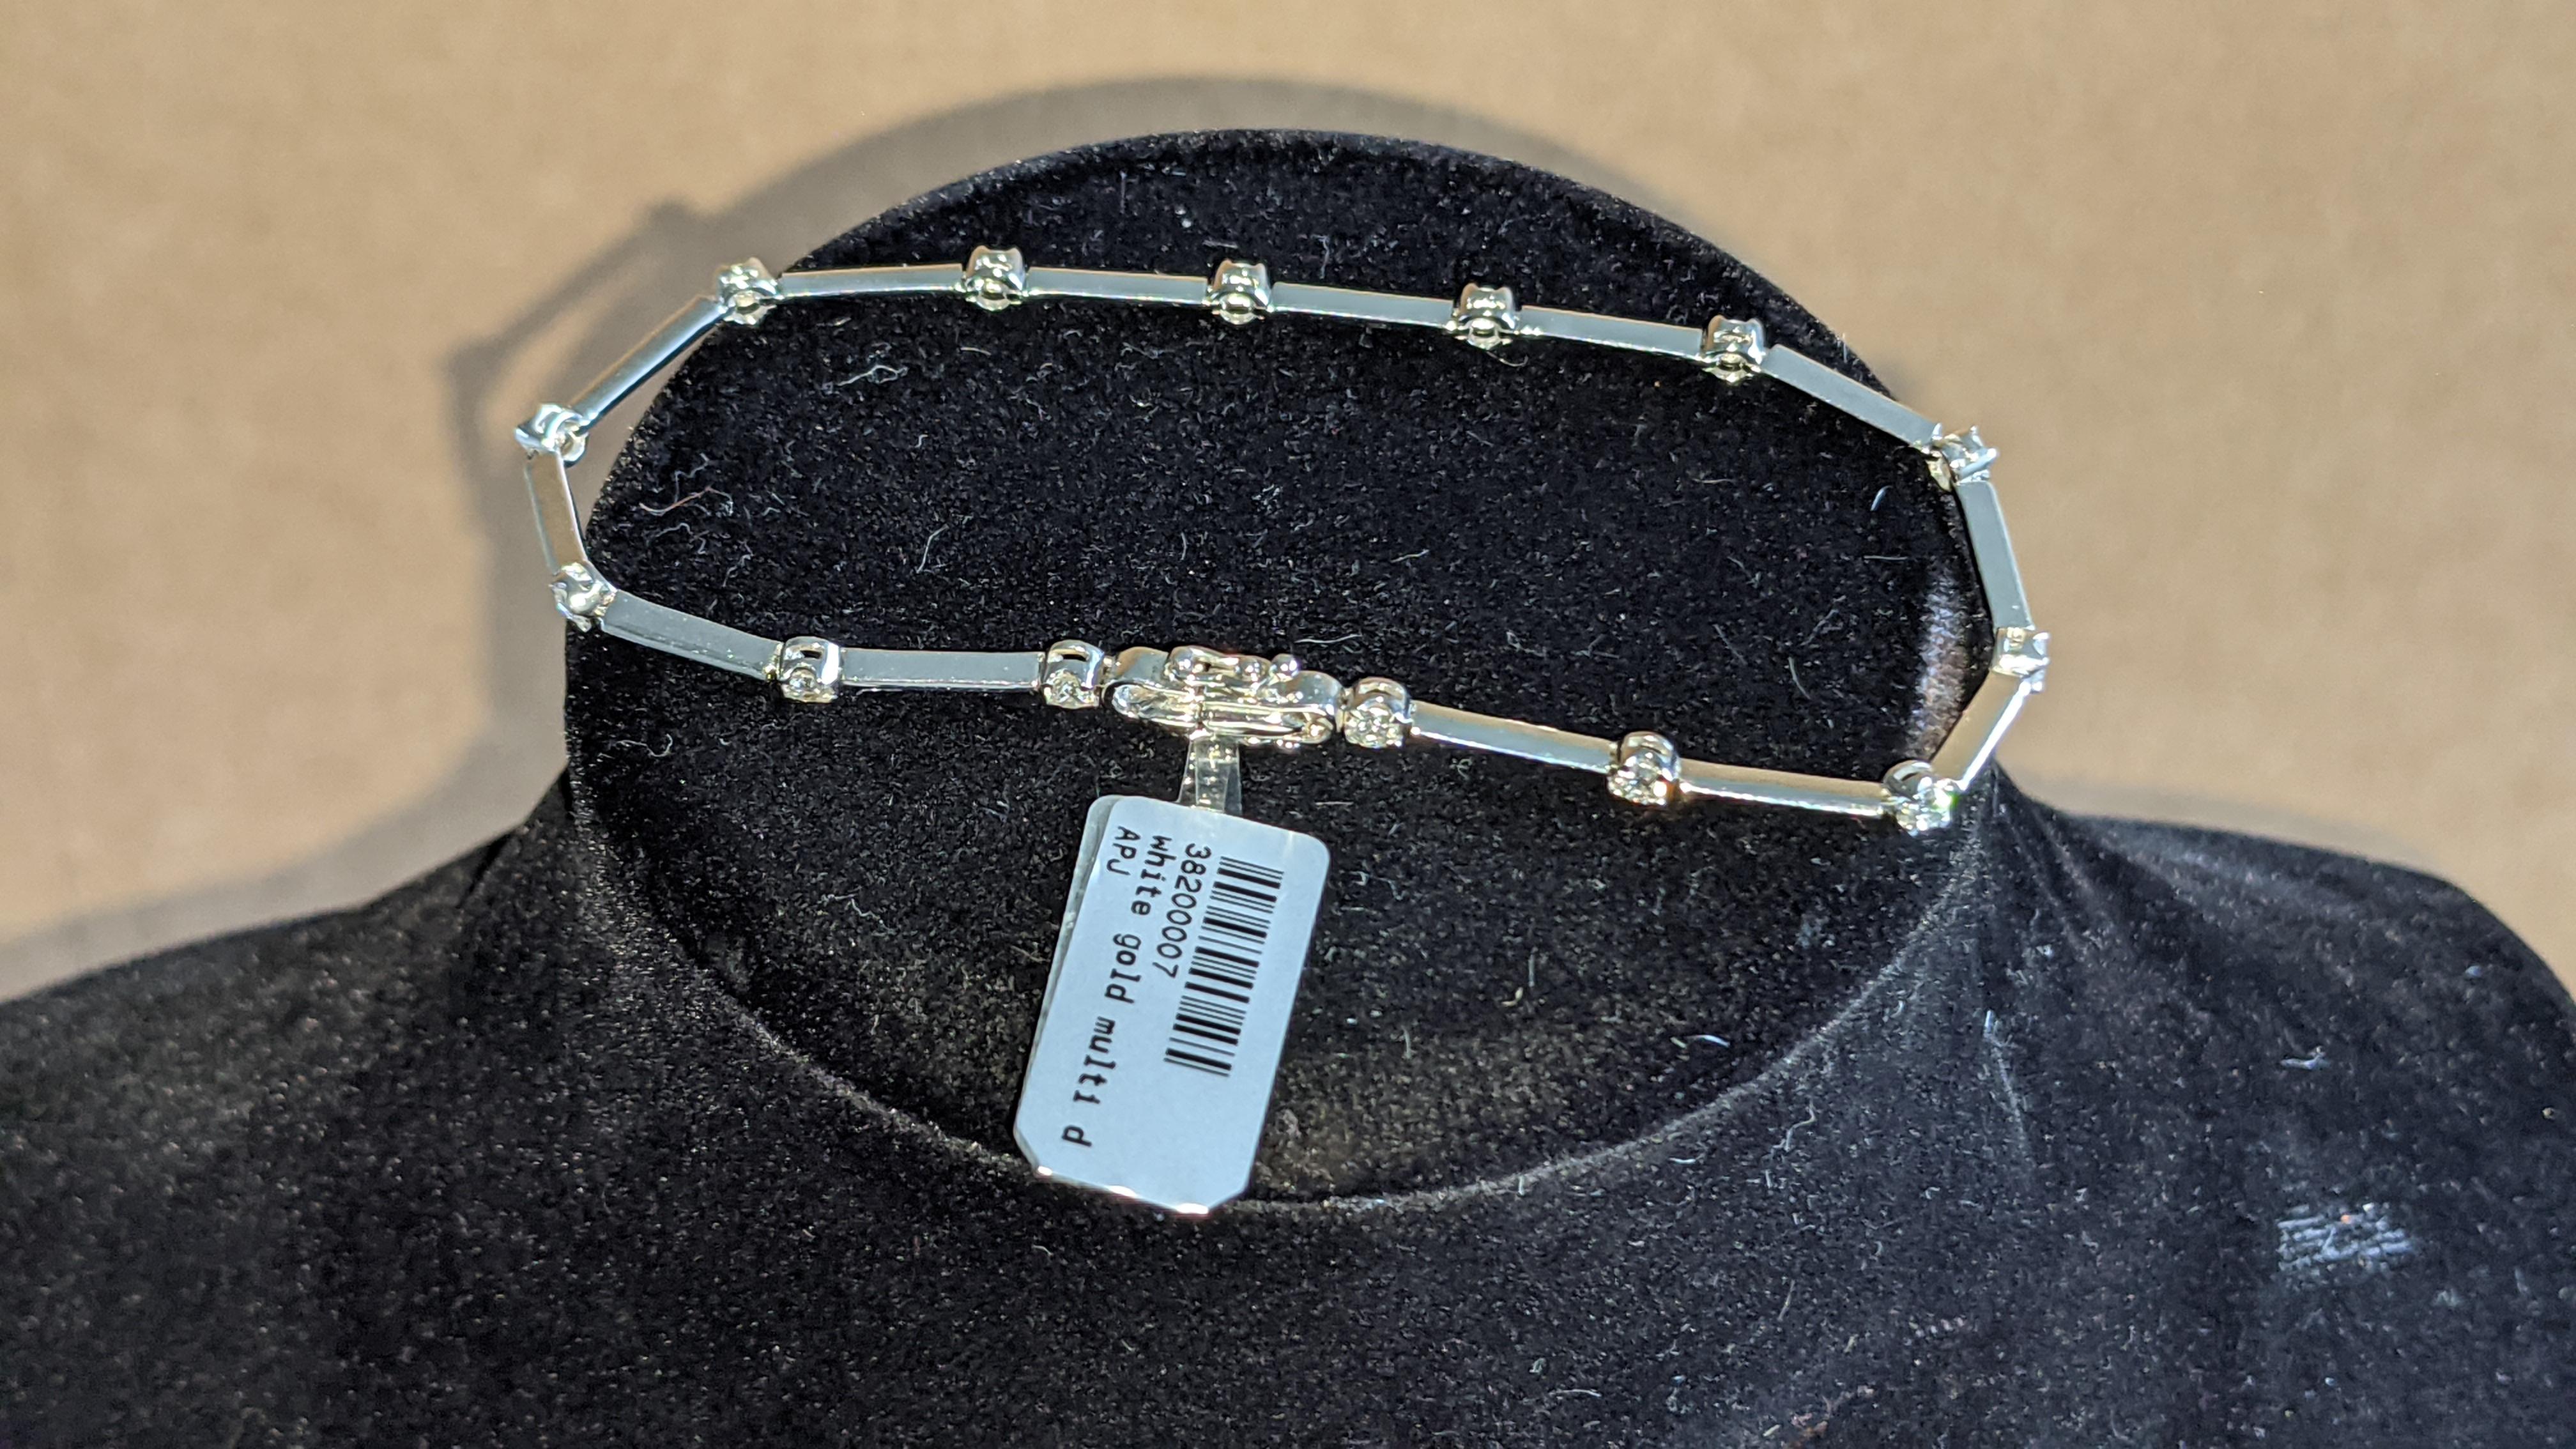 18ct white gold & diamond bracelet RRP £2,480 - Image 6 of 9